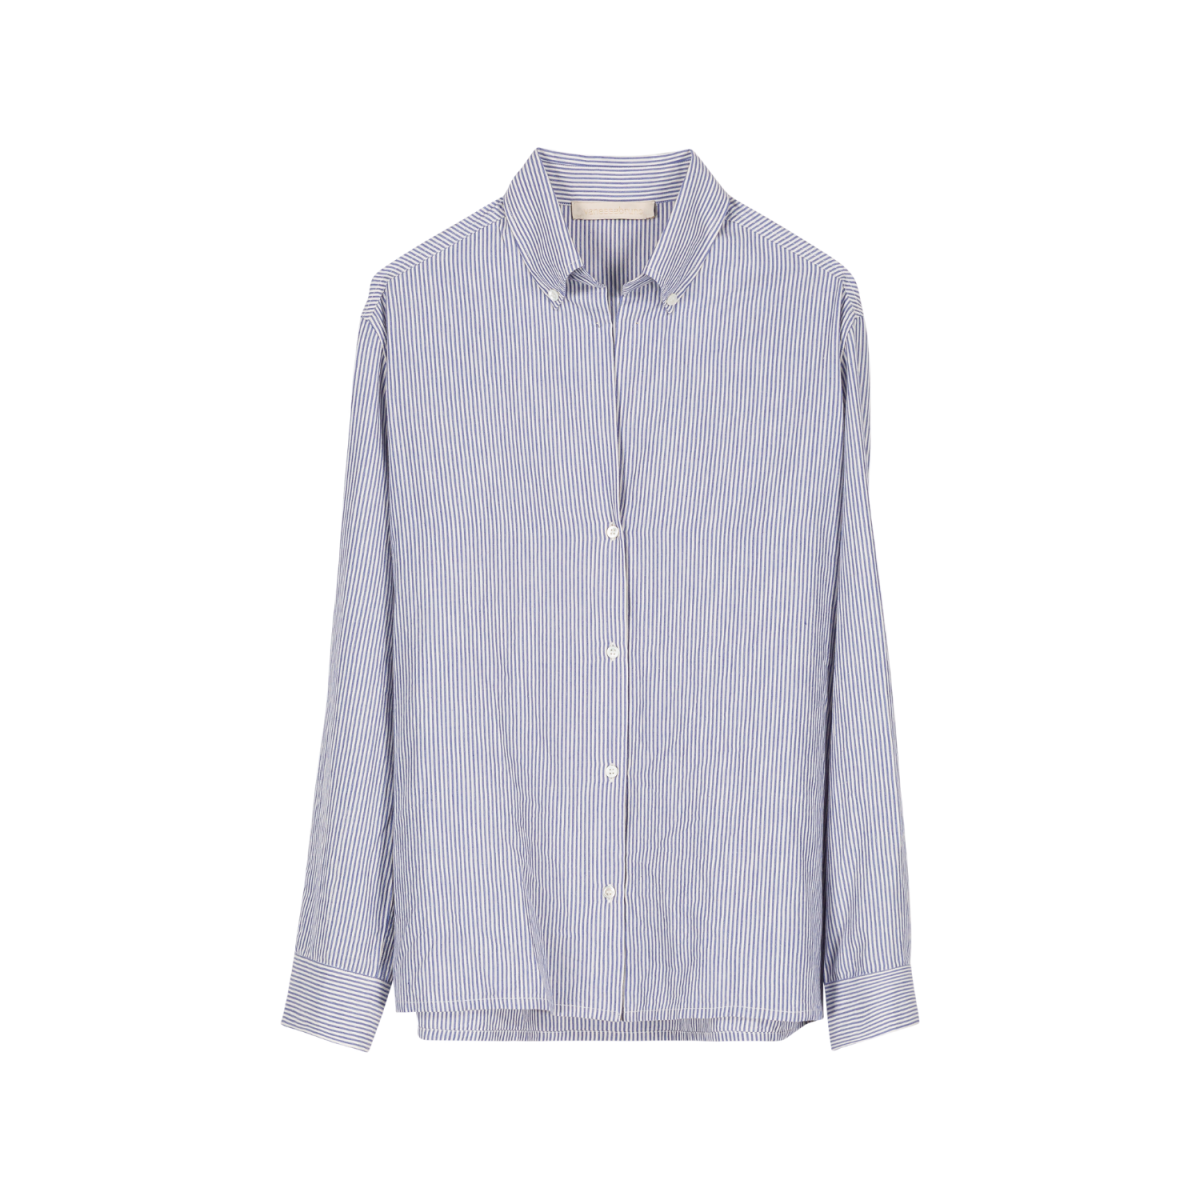 druyat skjorte - blance bleu